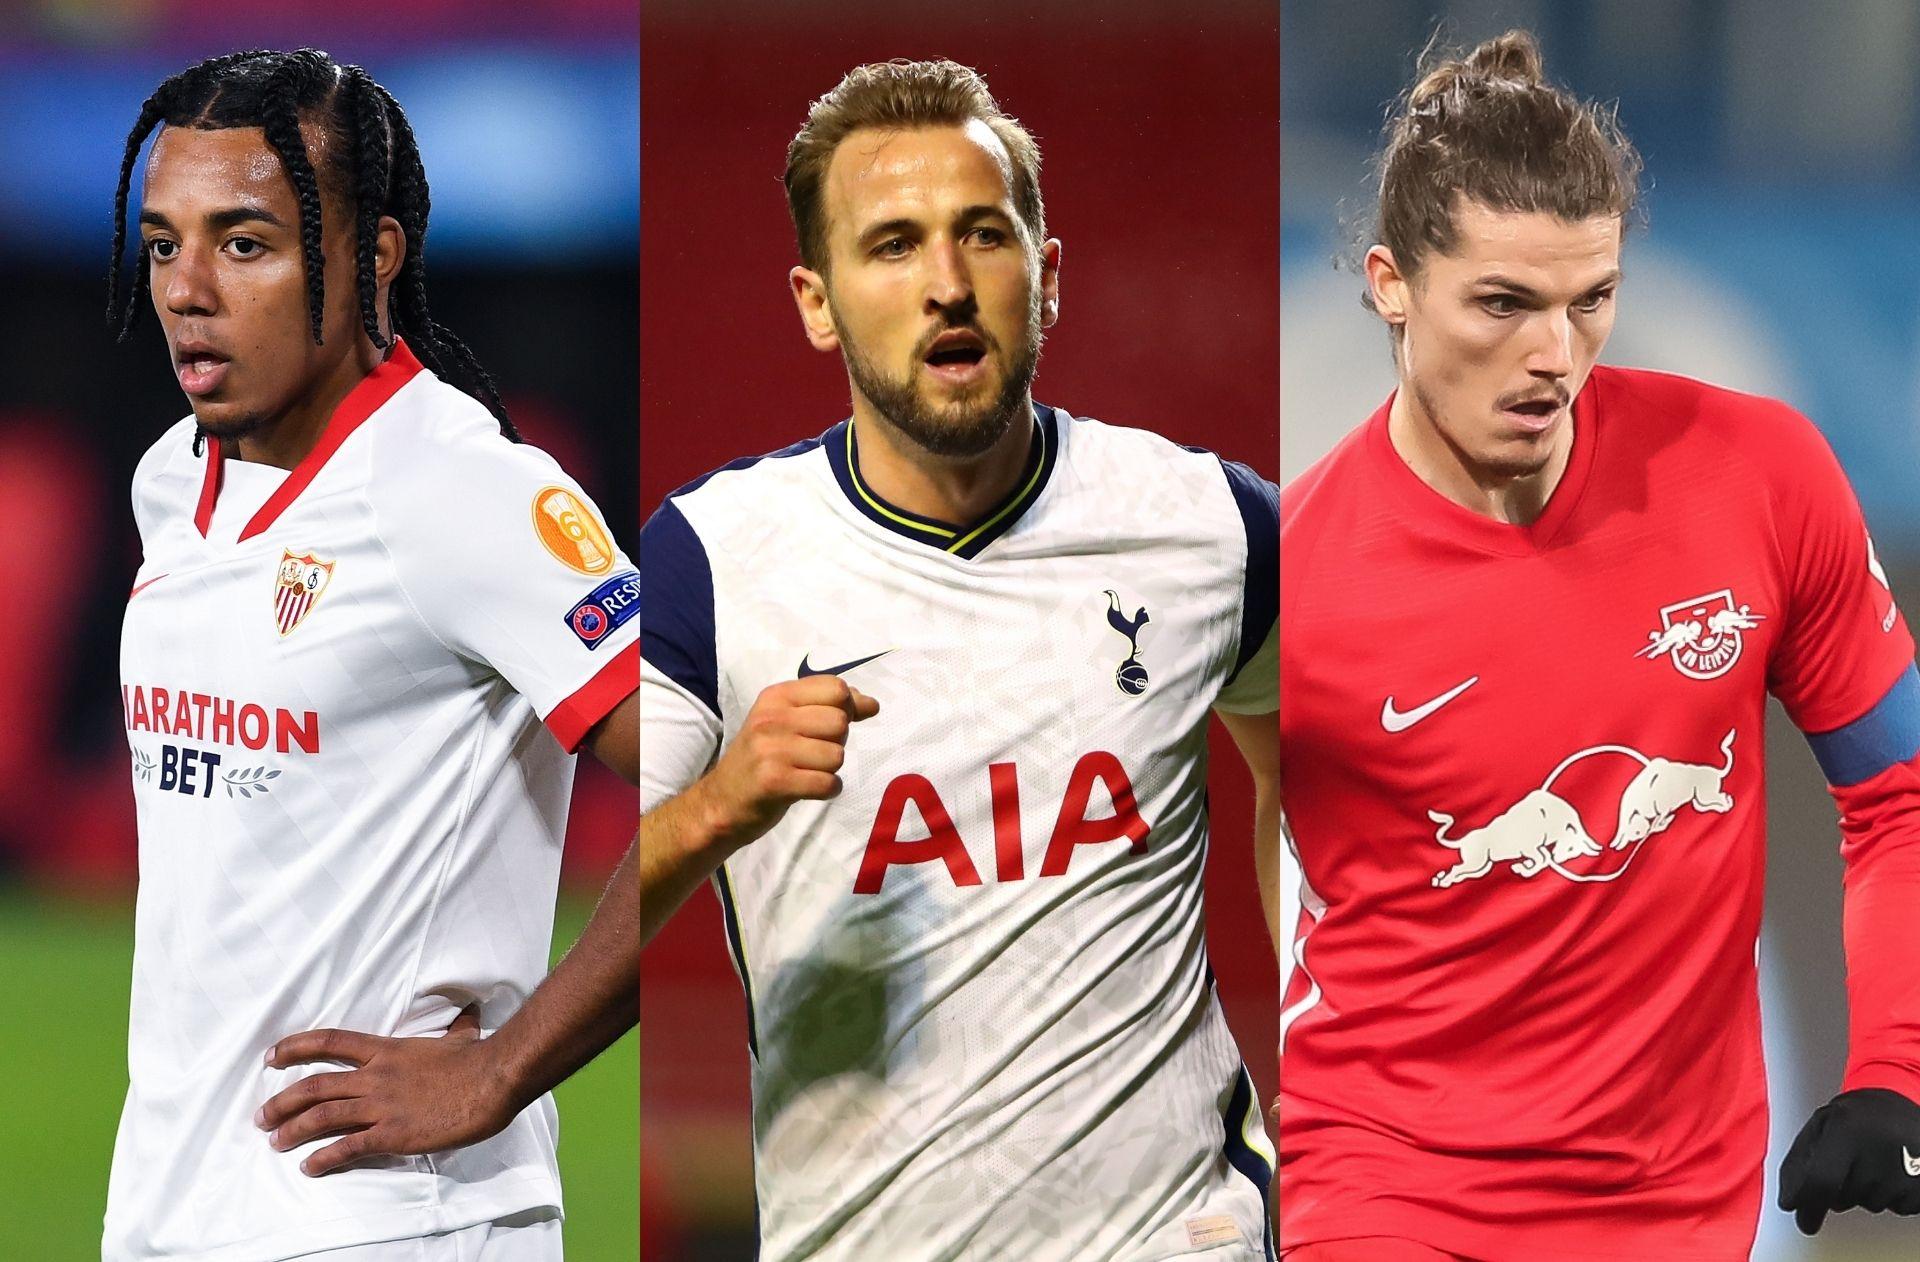 Jules Kounde of Sevilla, Harry Kane of Tottenham, Marcel Sabitzer of RB Salzburg